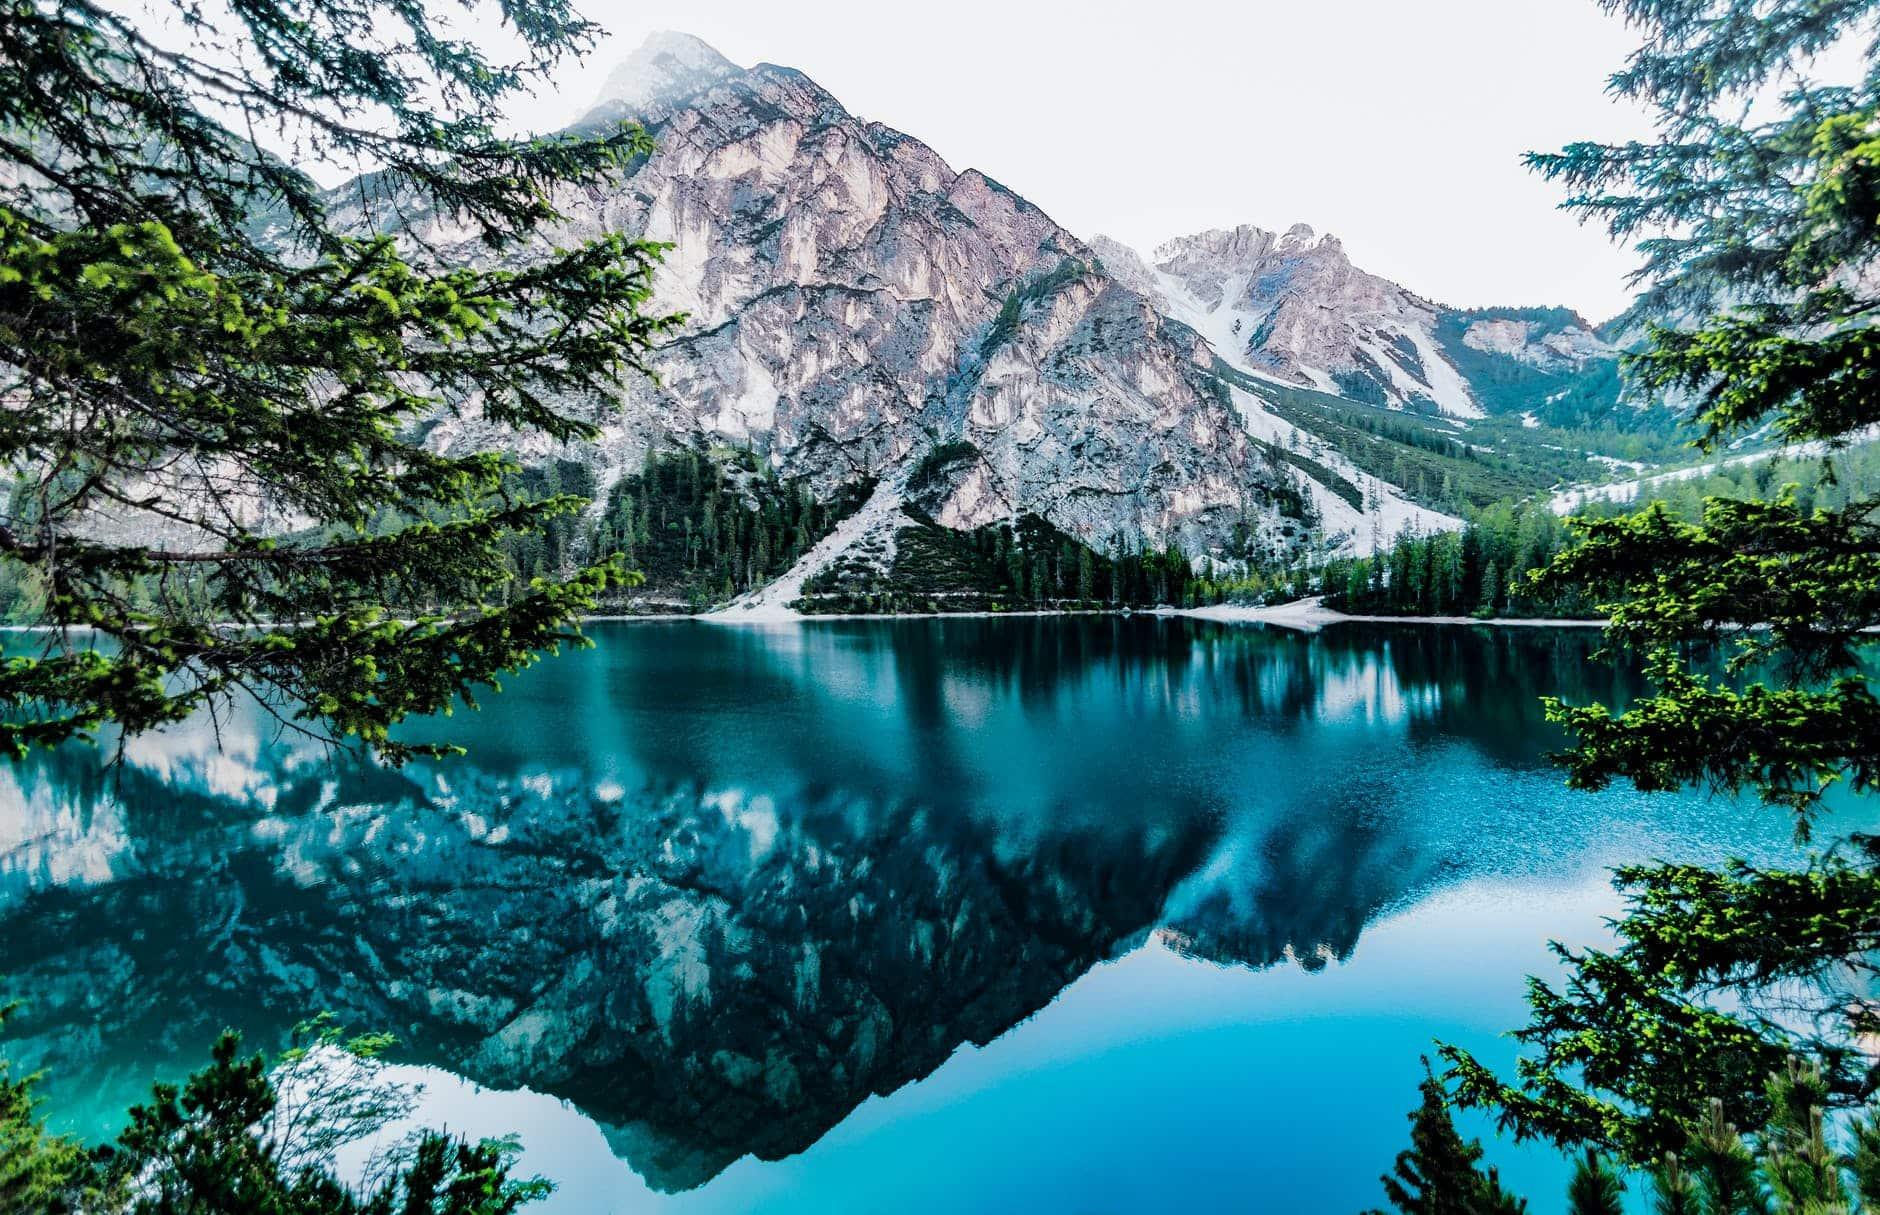 lake and mountain under white sky